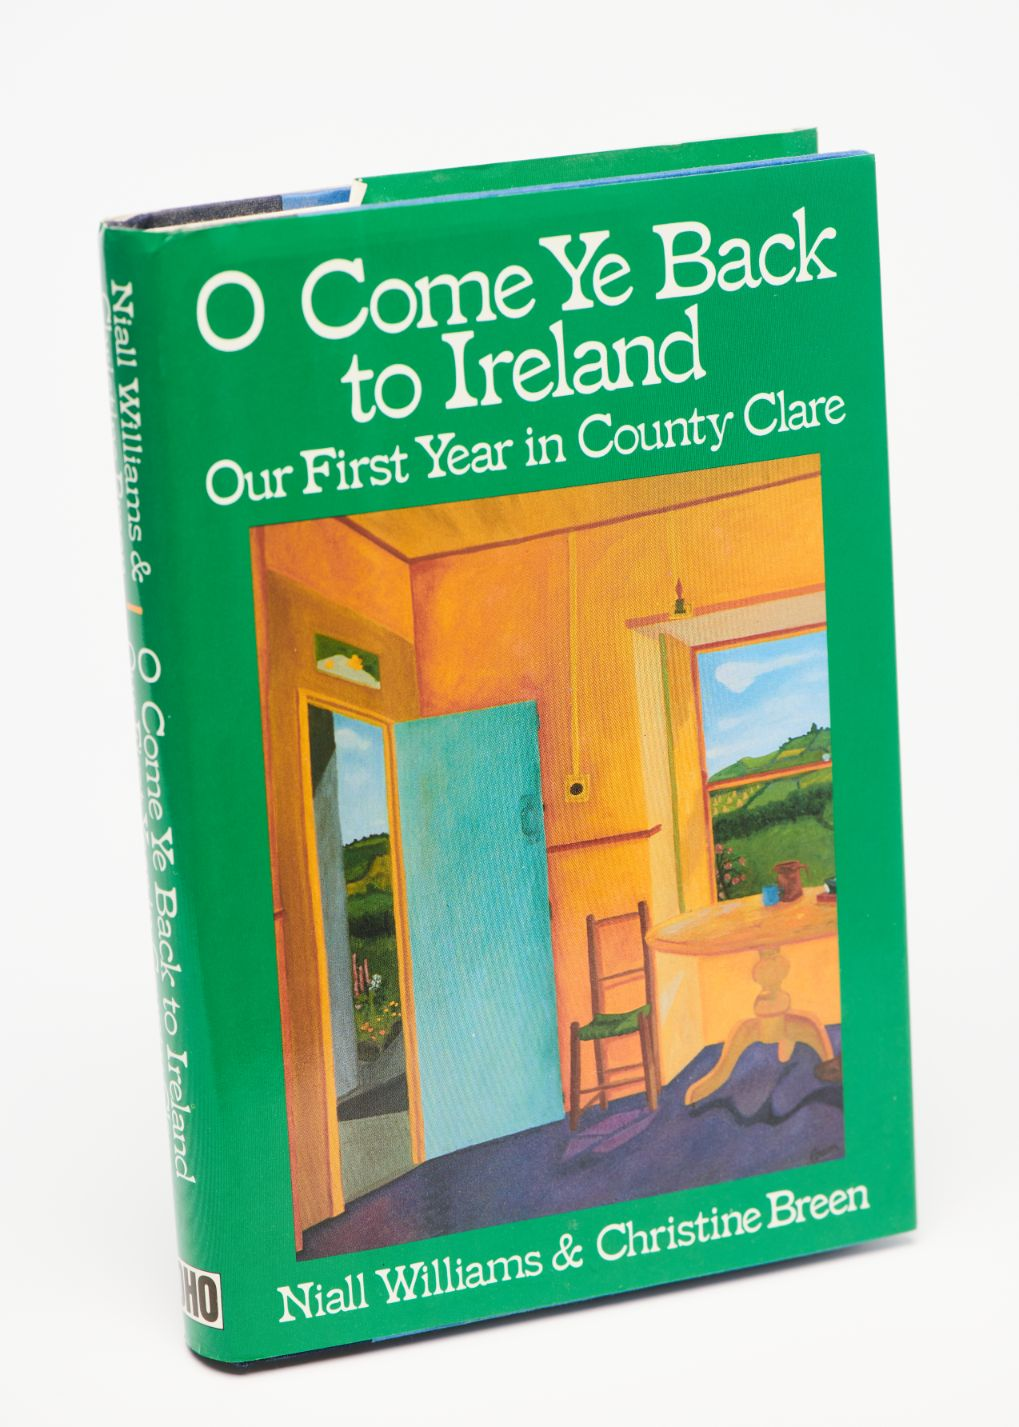 Niall Williams Books